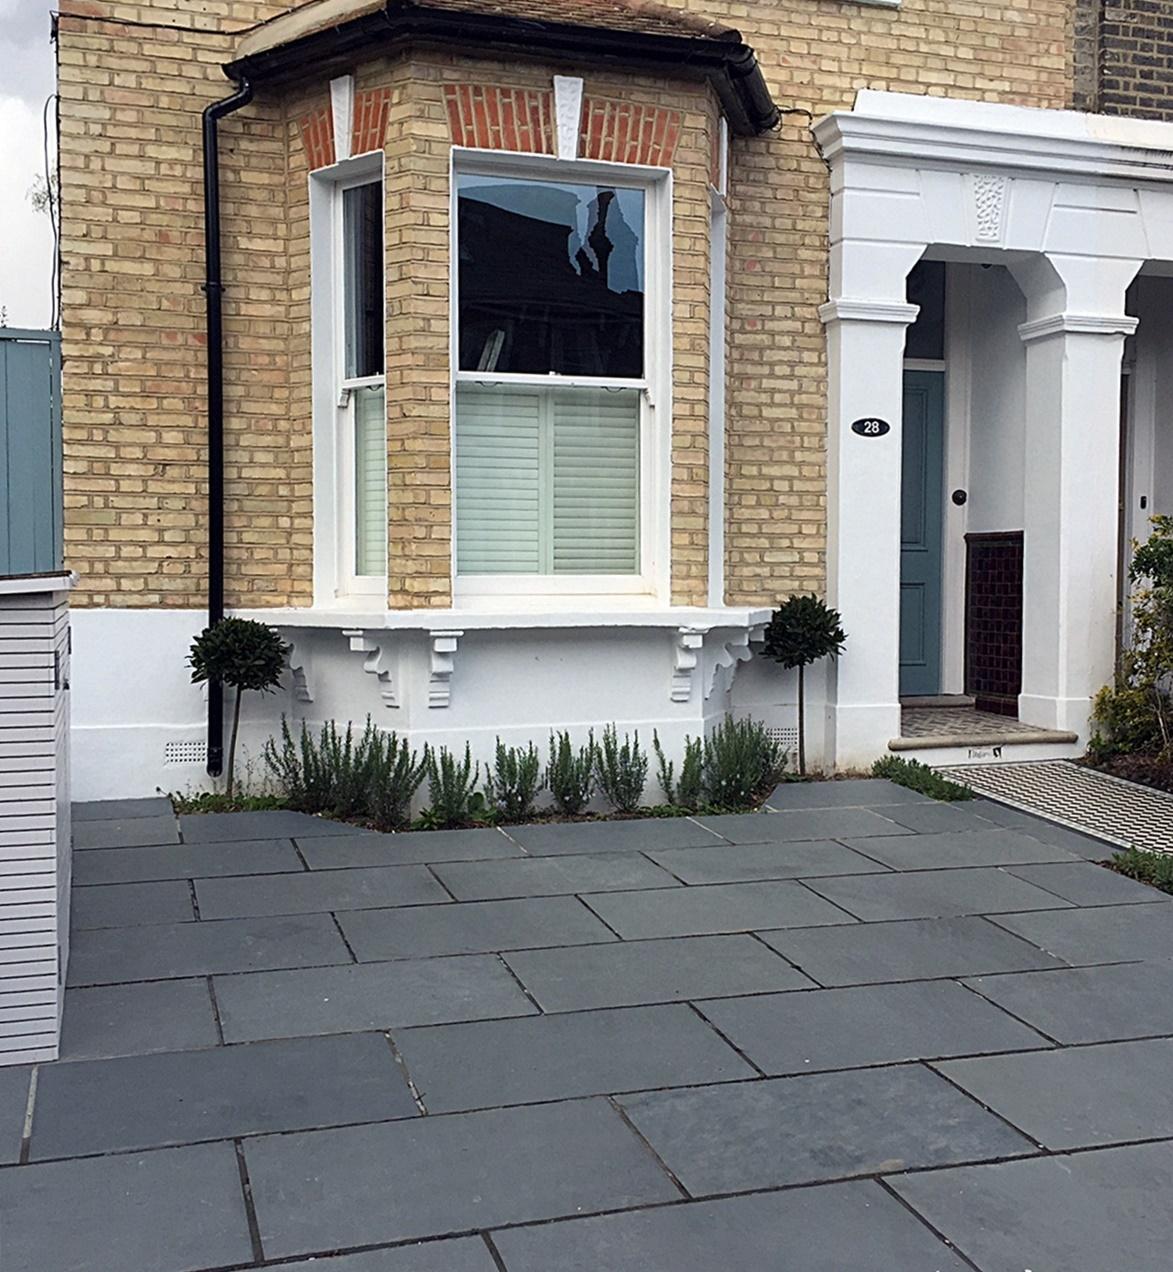 Dulwich driveway grey colour tile front garden bespoke bin store London Wandsworth Clapham Balham